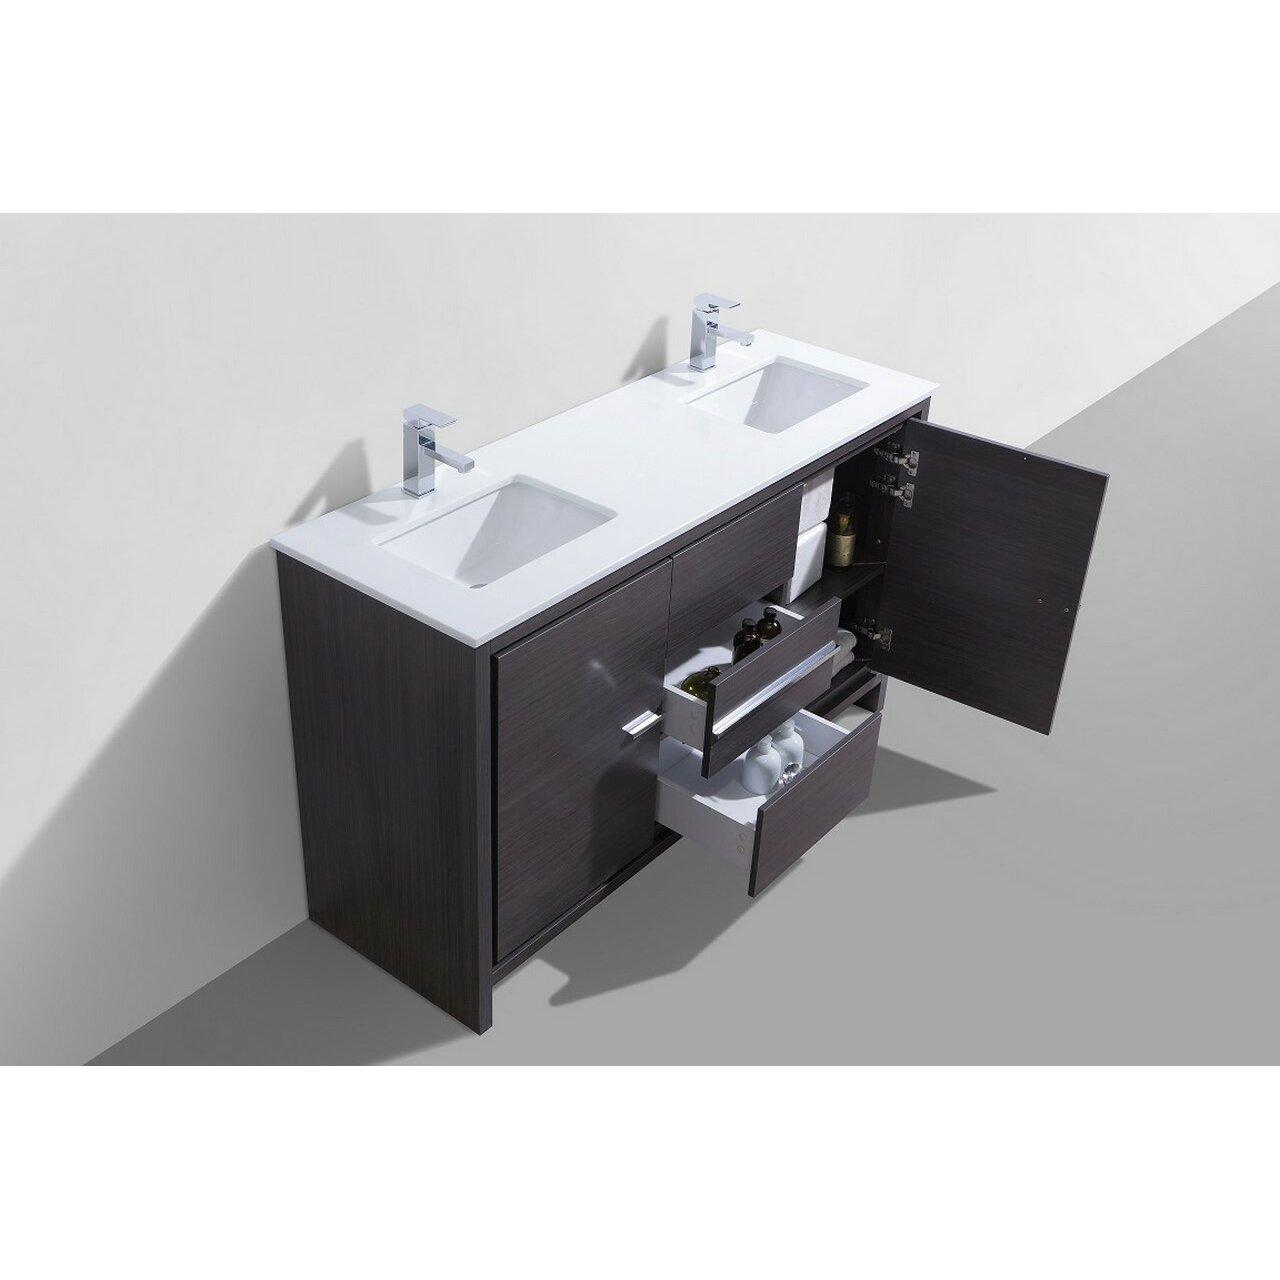 Kube bath dolce 60 double sink modern bathroom vanity reviews - Modern bathroom vanity double sink ...